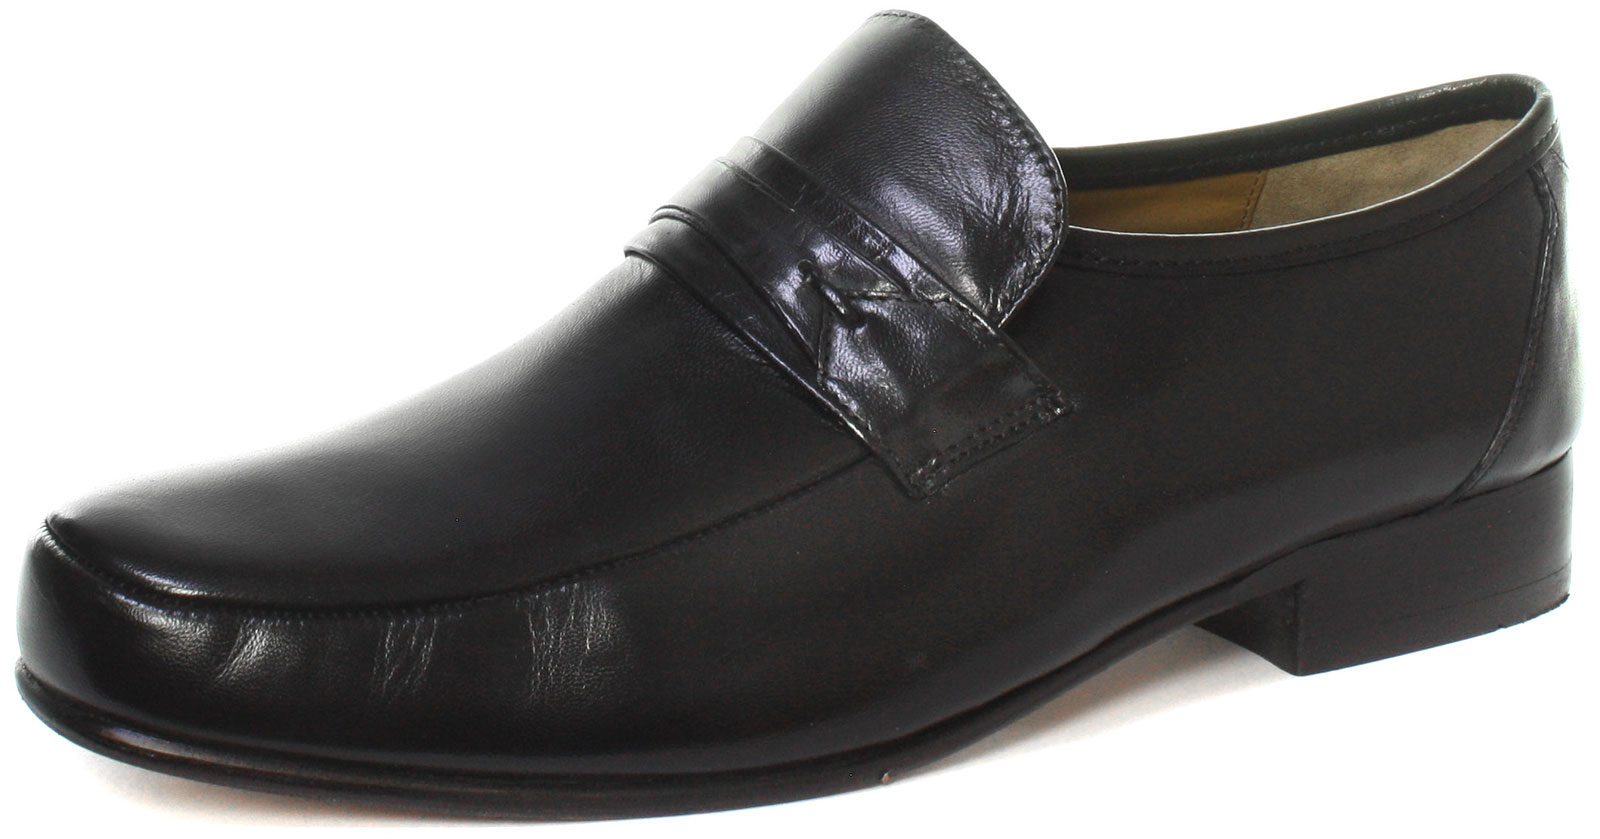 Kensington Classics Saddle Trim Mudguard Black Mens shoes ALL SIZES